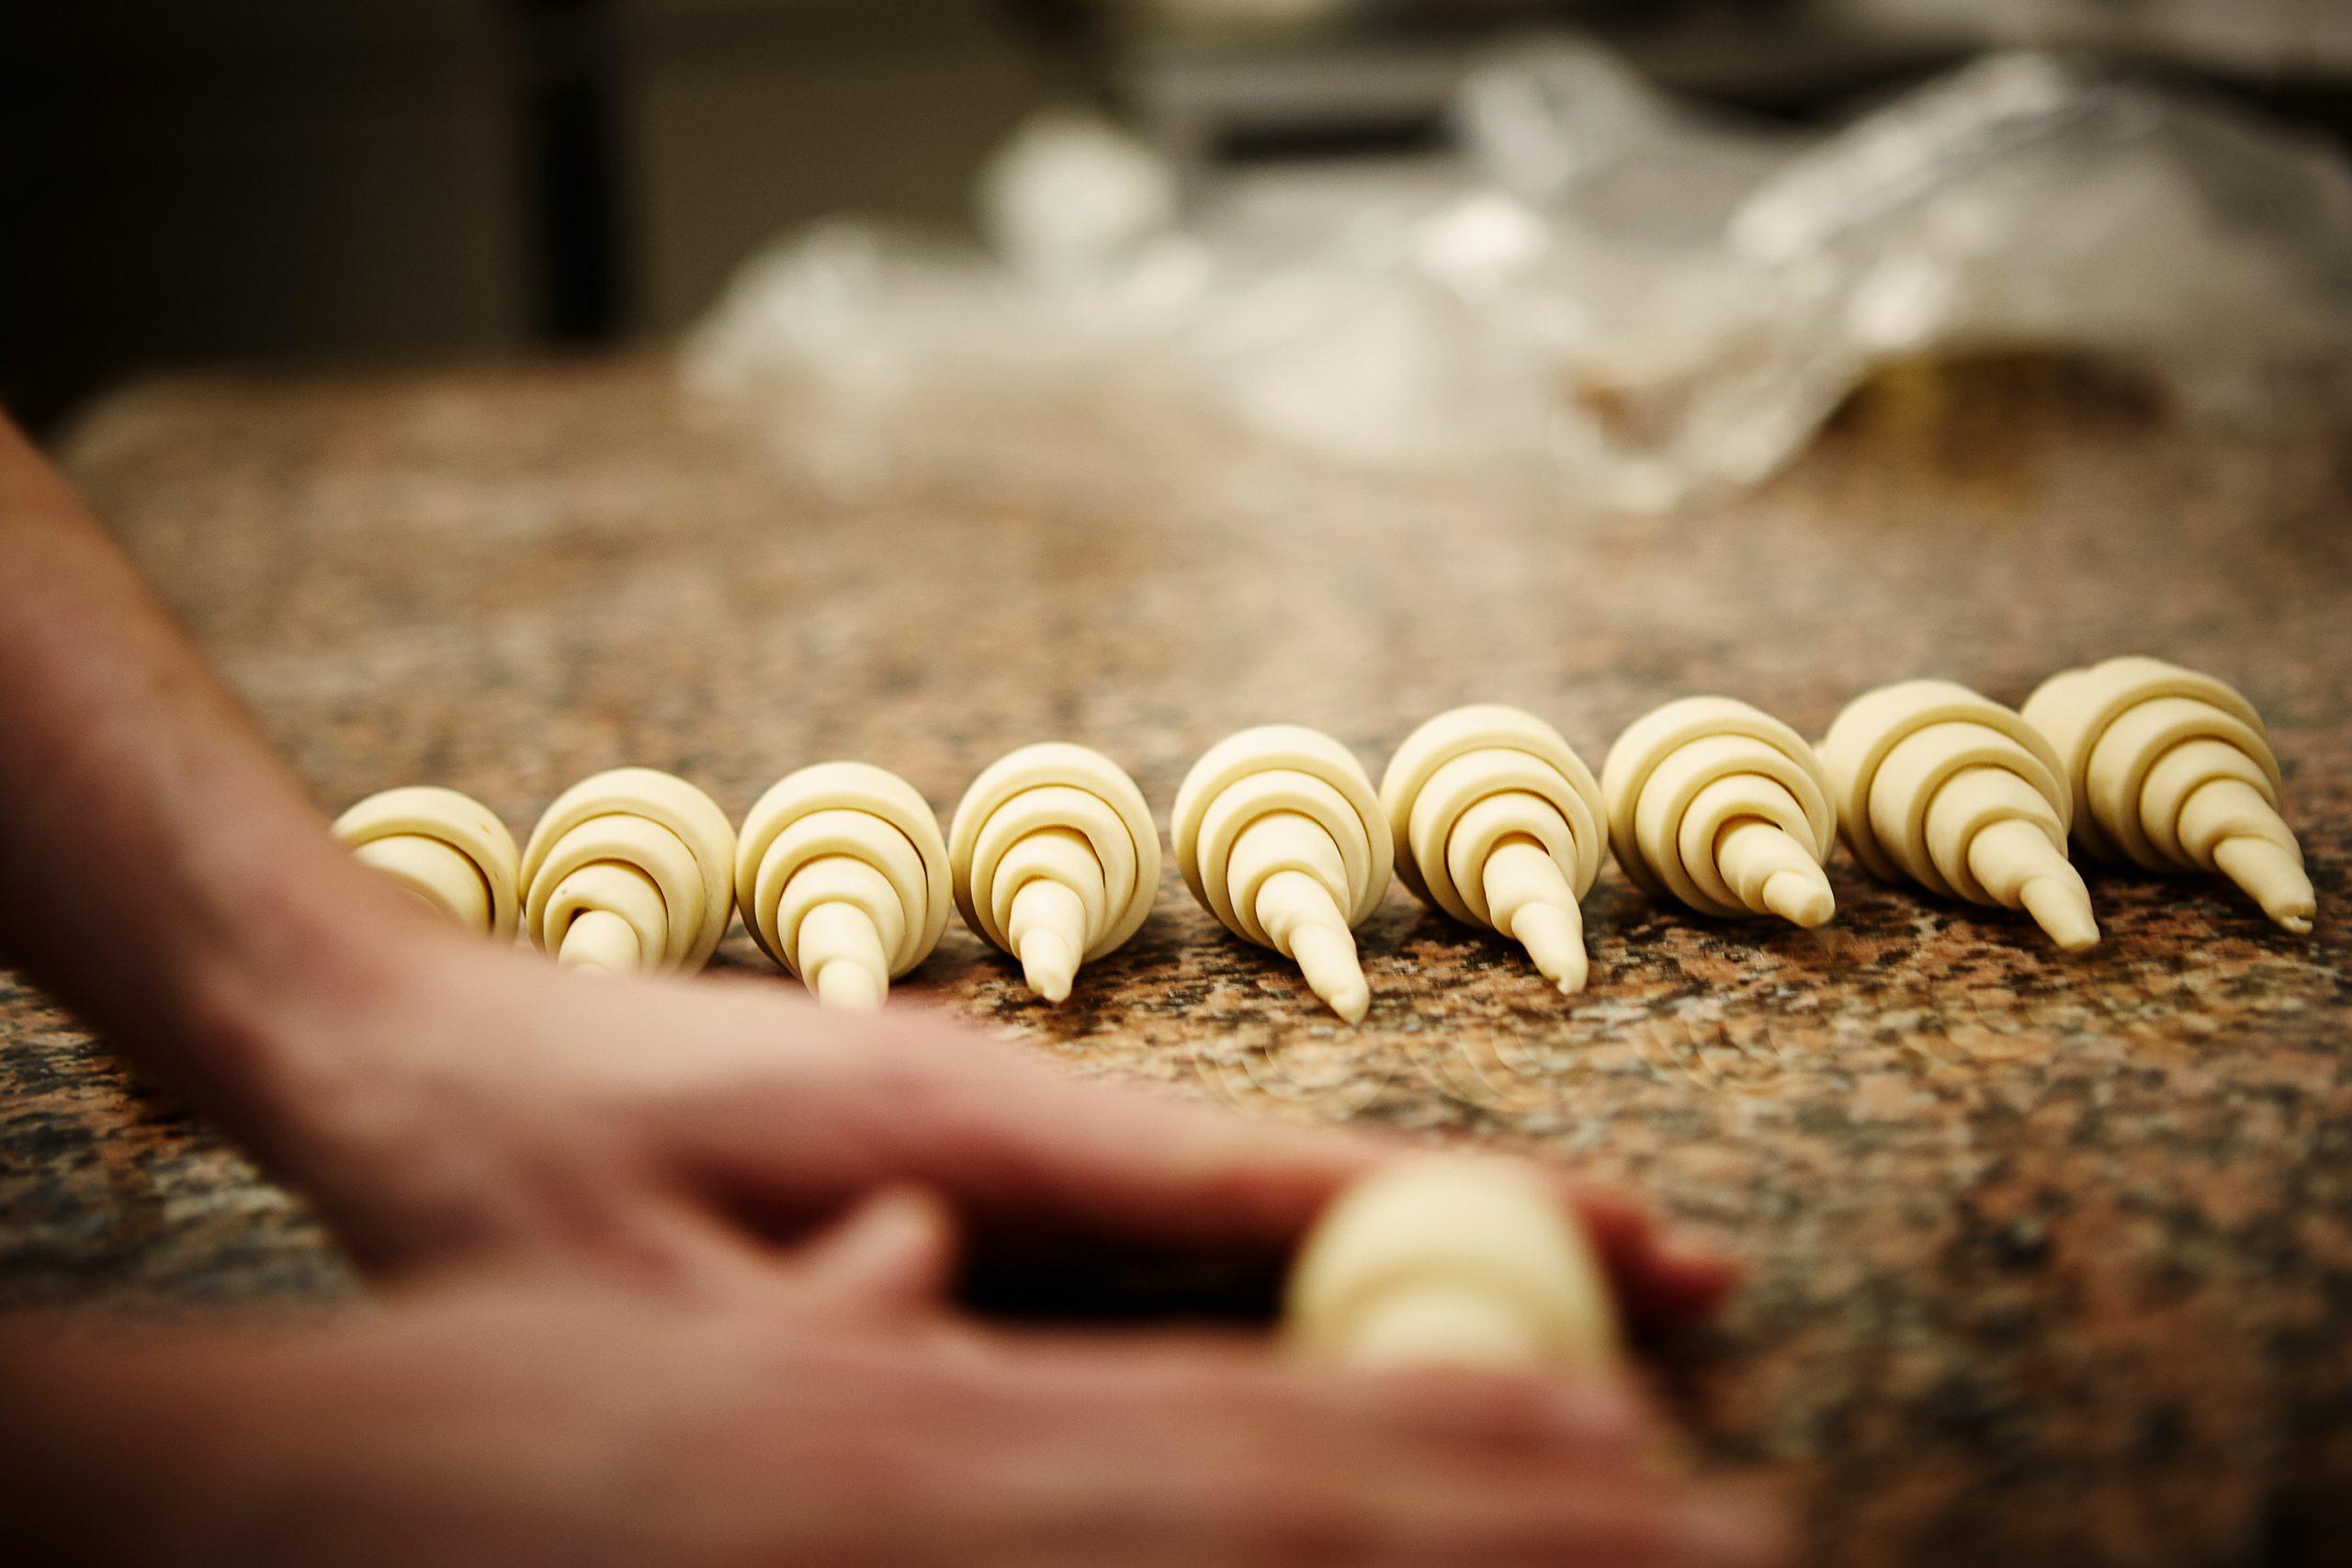 croissant PAINPAIN LAPETITEGROSSE